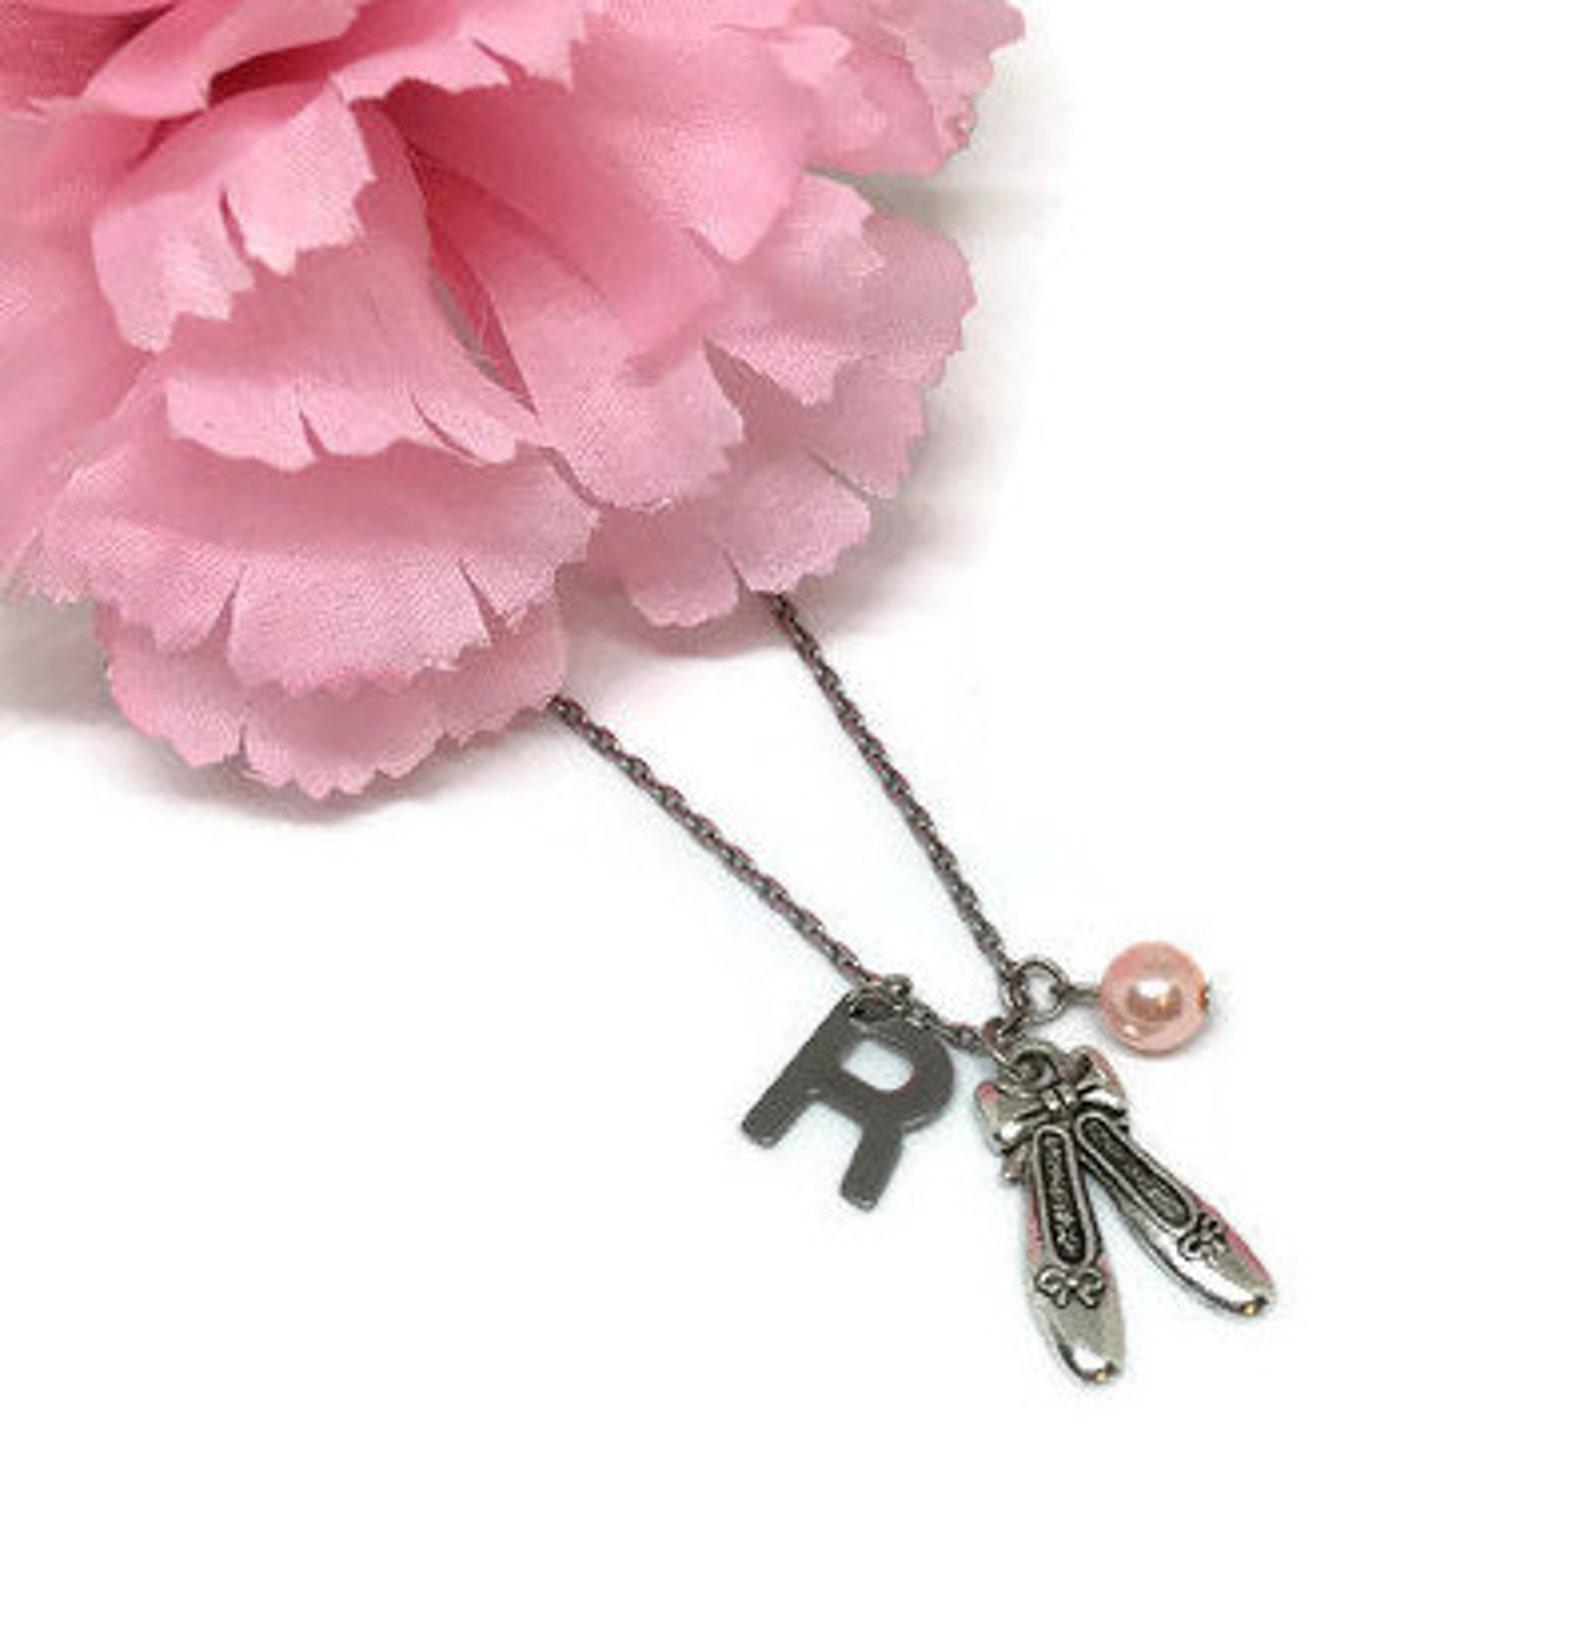 ballet necklace ballerina necklace ballerina jewelry dance jewelry dance necklace ballet gifts dancer charm dance lover gift bal